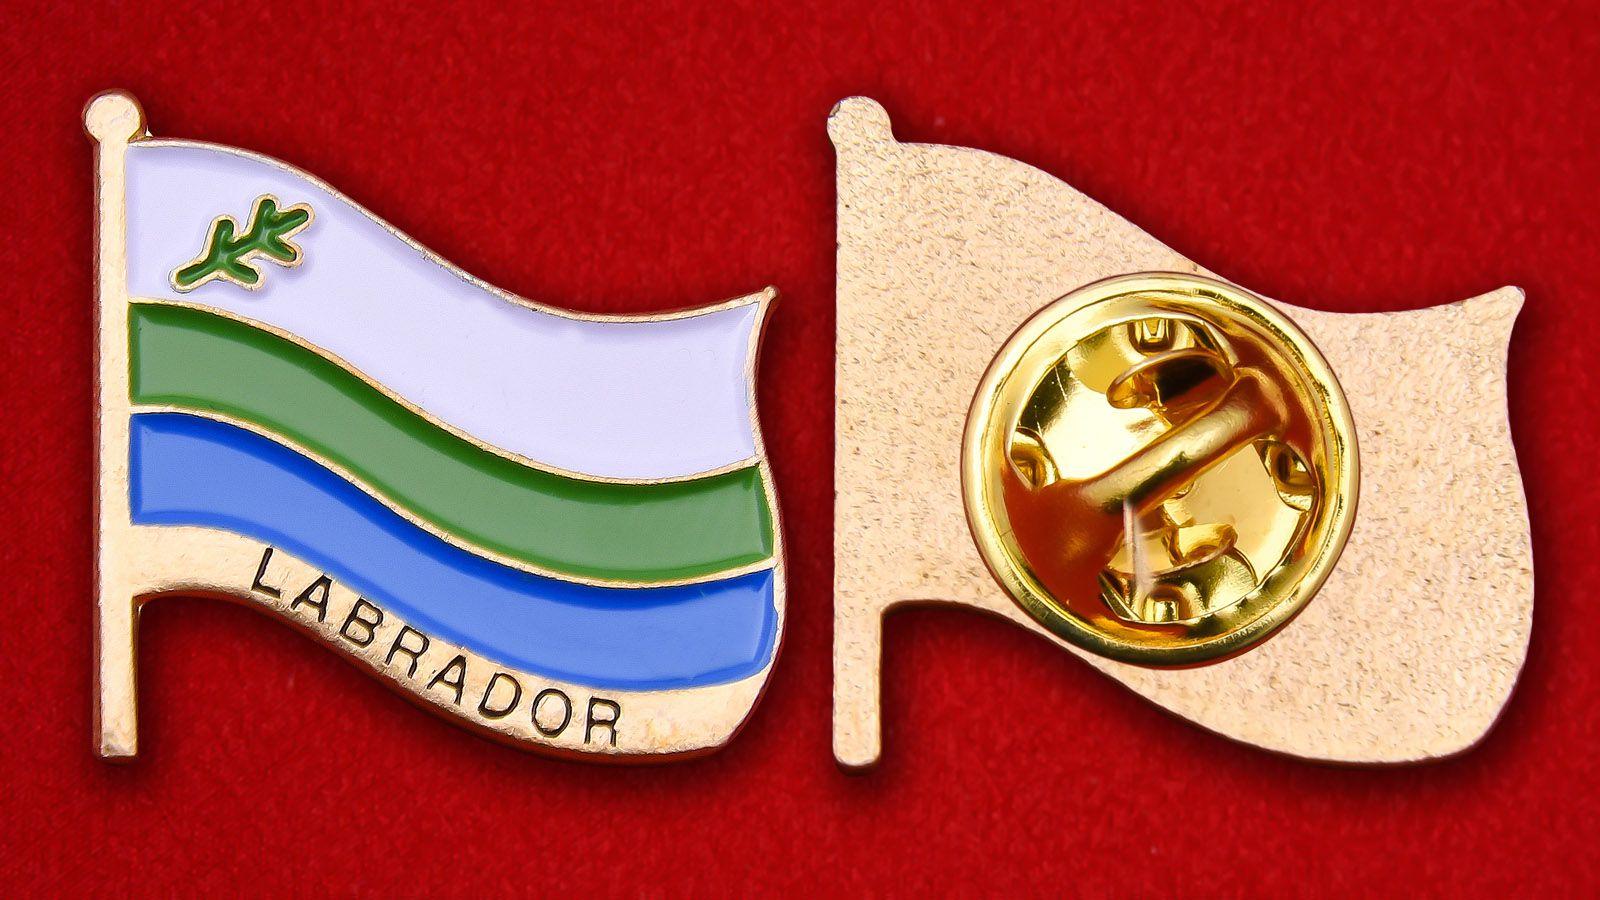 Значок Флага Лабрадора - аверс и реверс